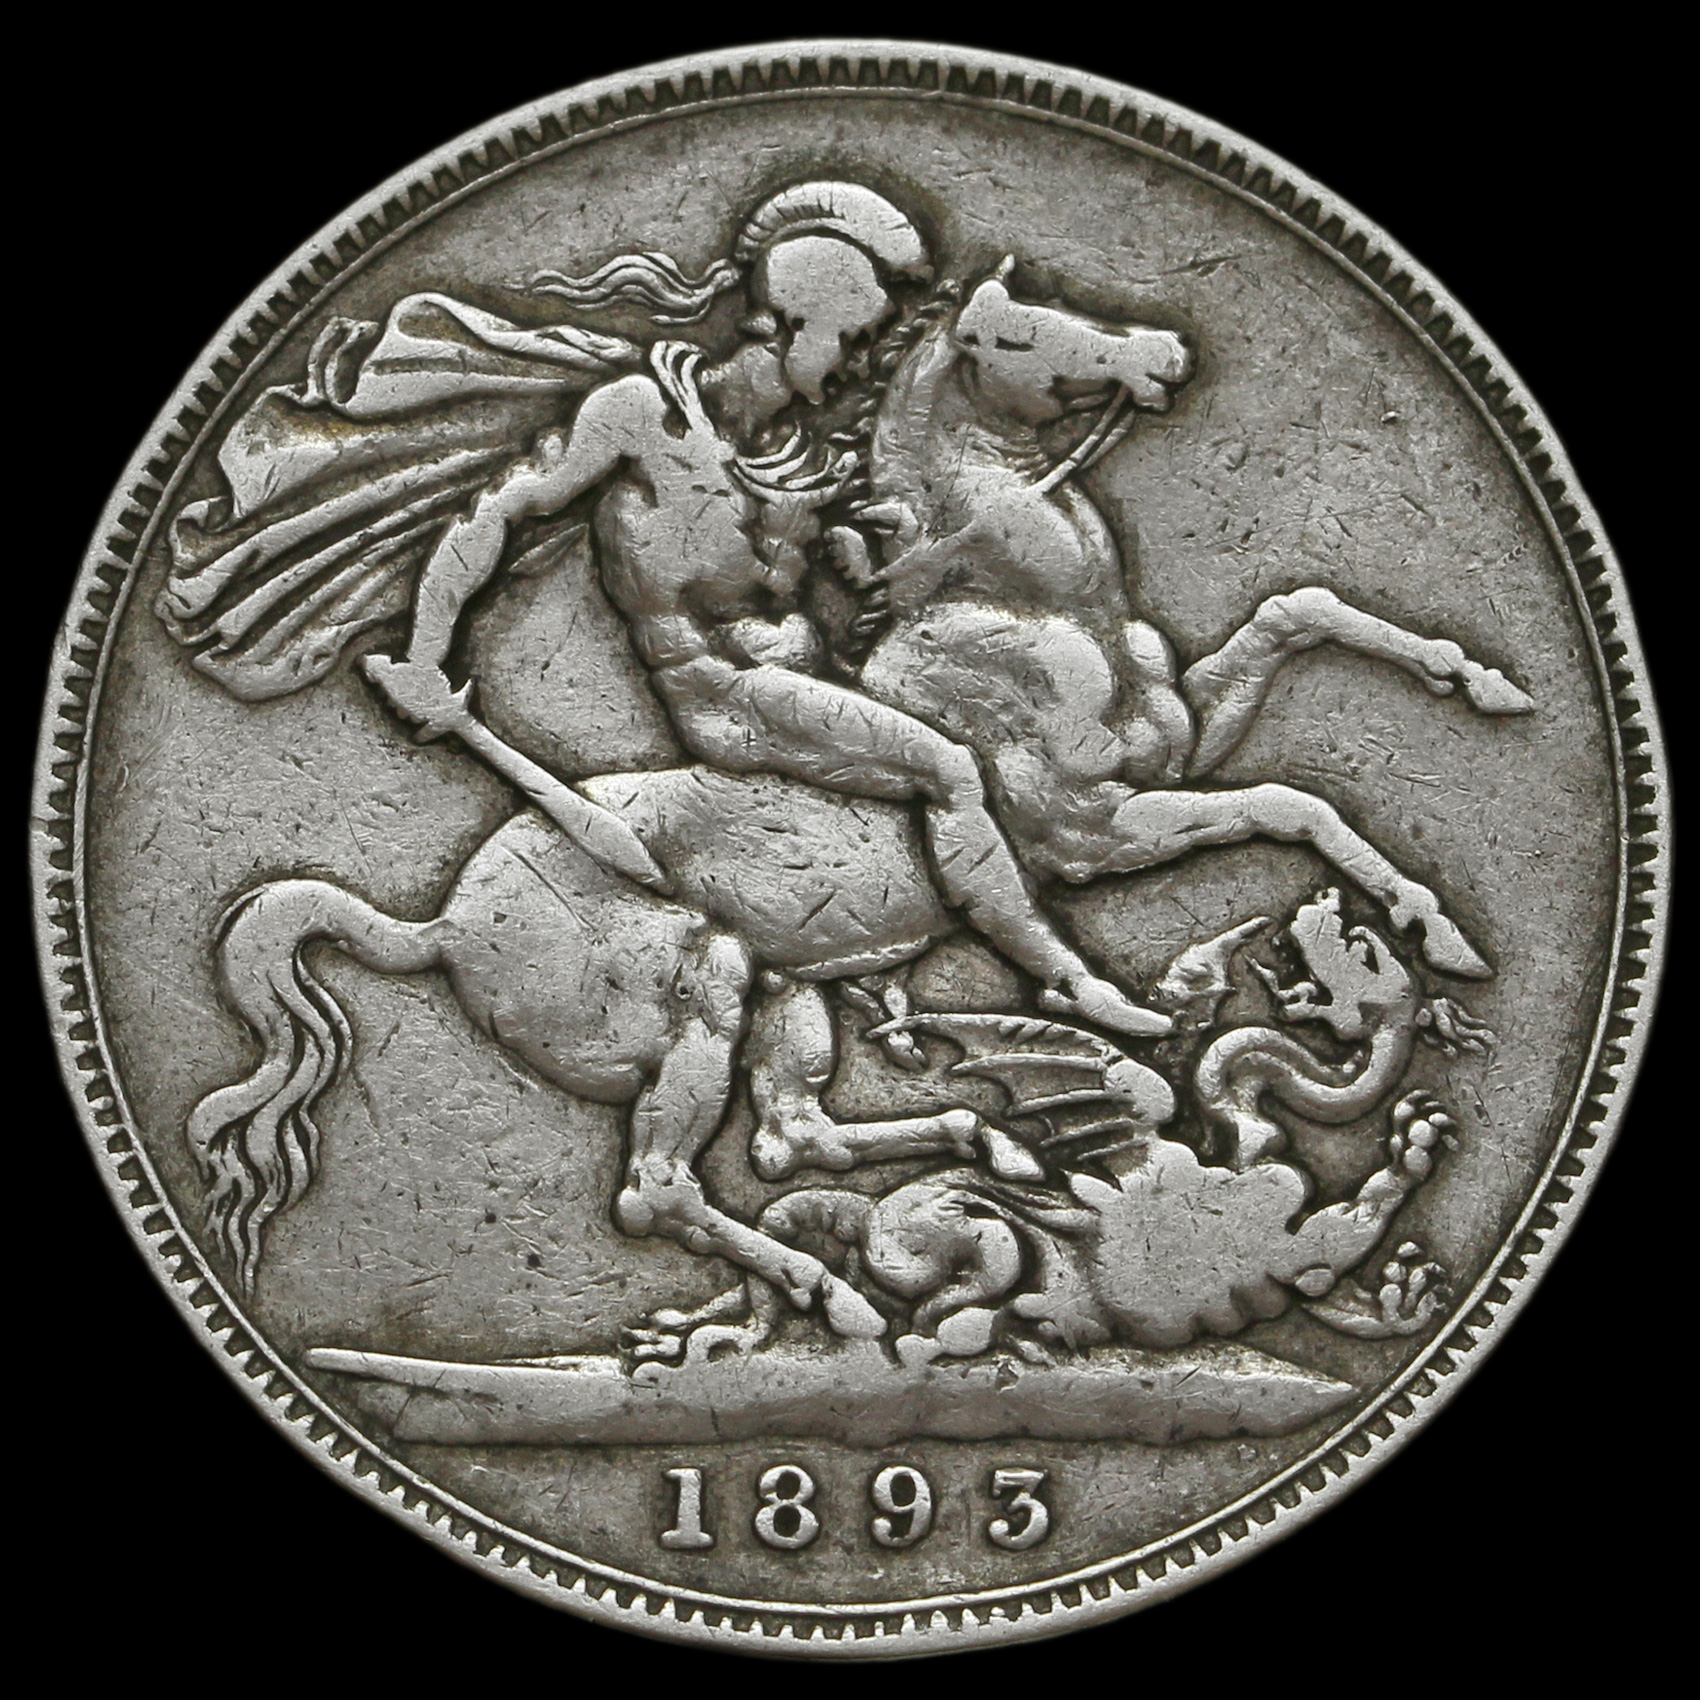 1893 Queen Victoria Veiled Head Silver Lvii Crown Rare